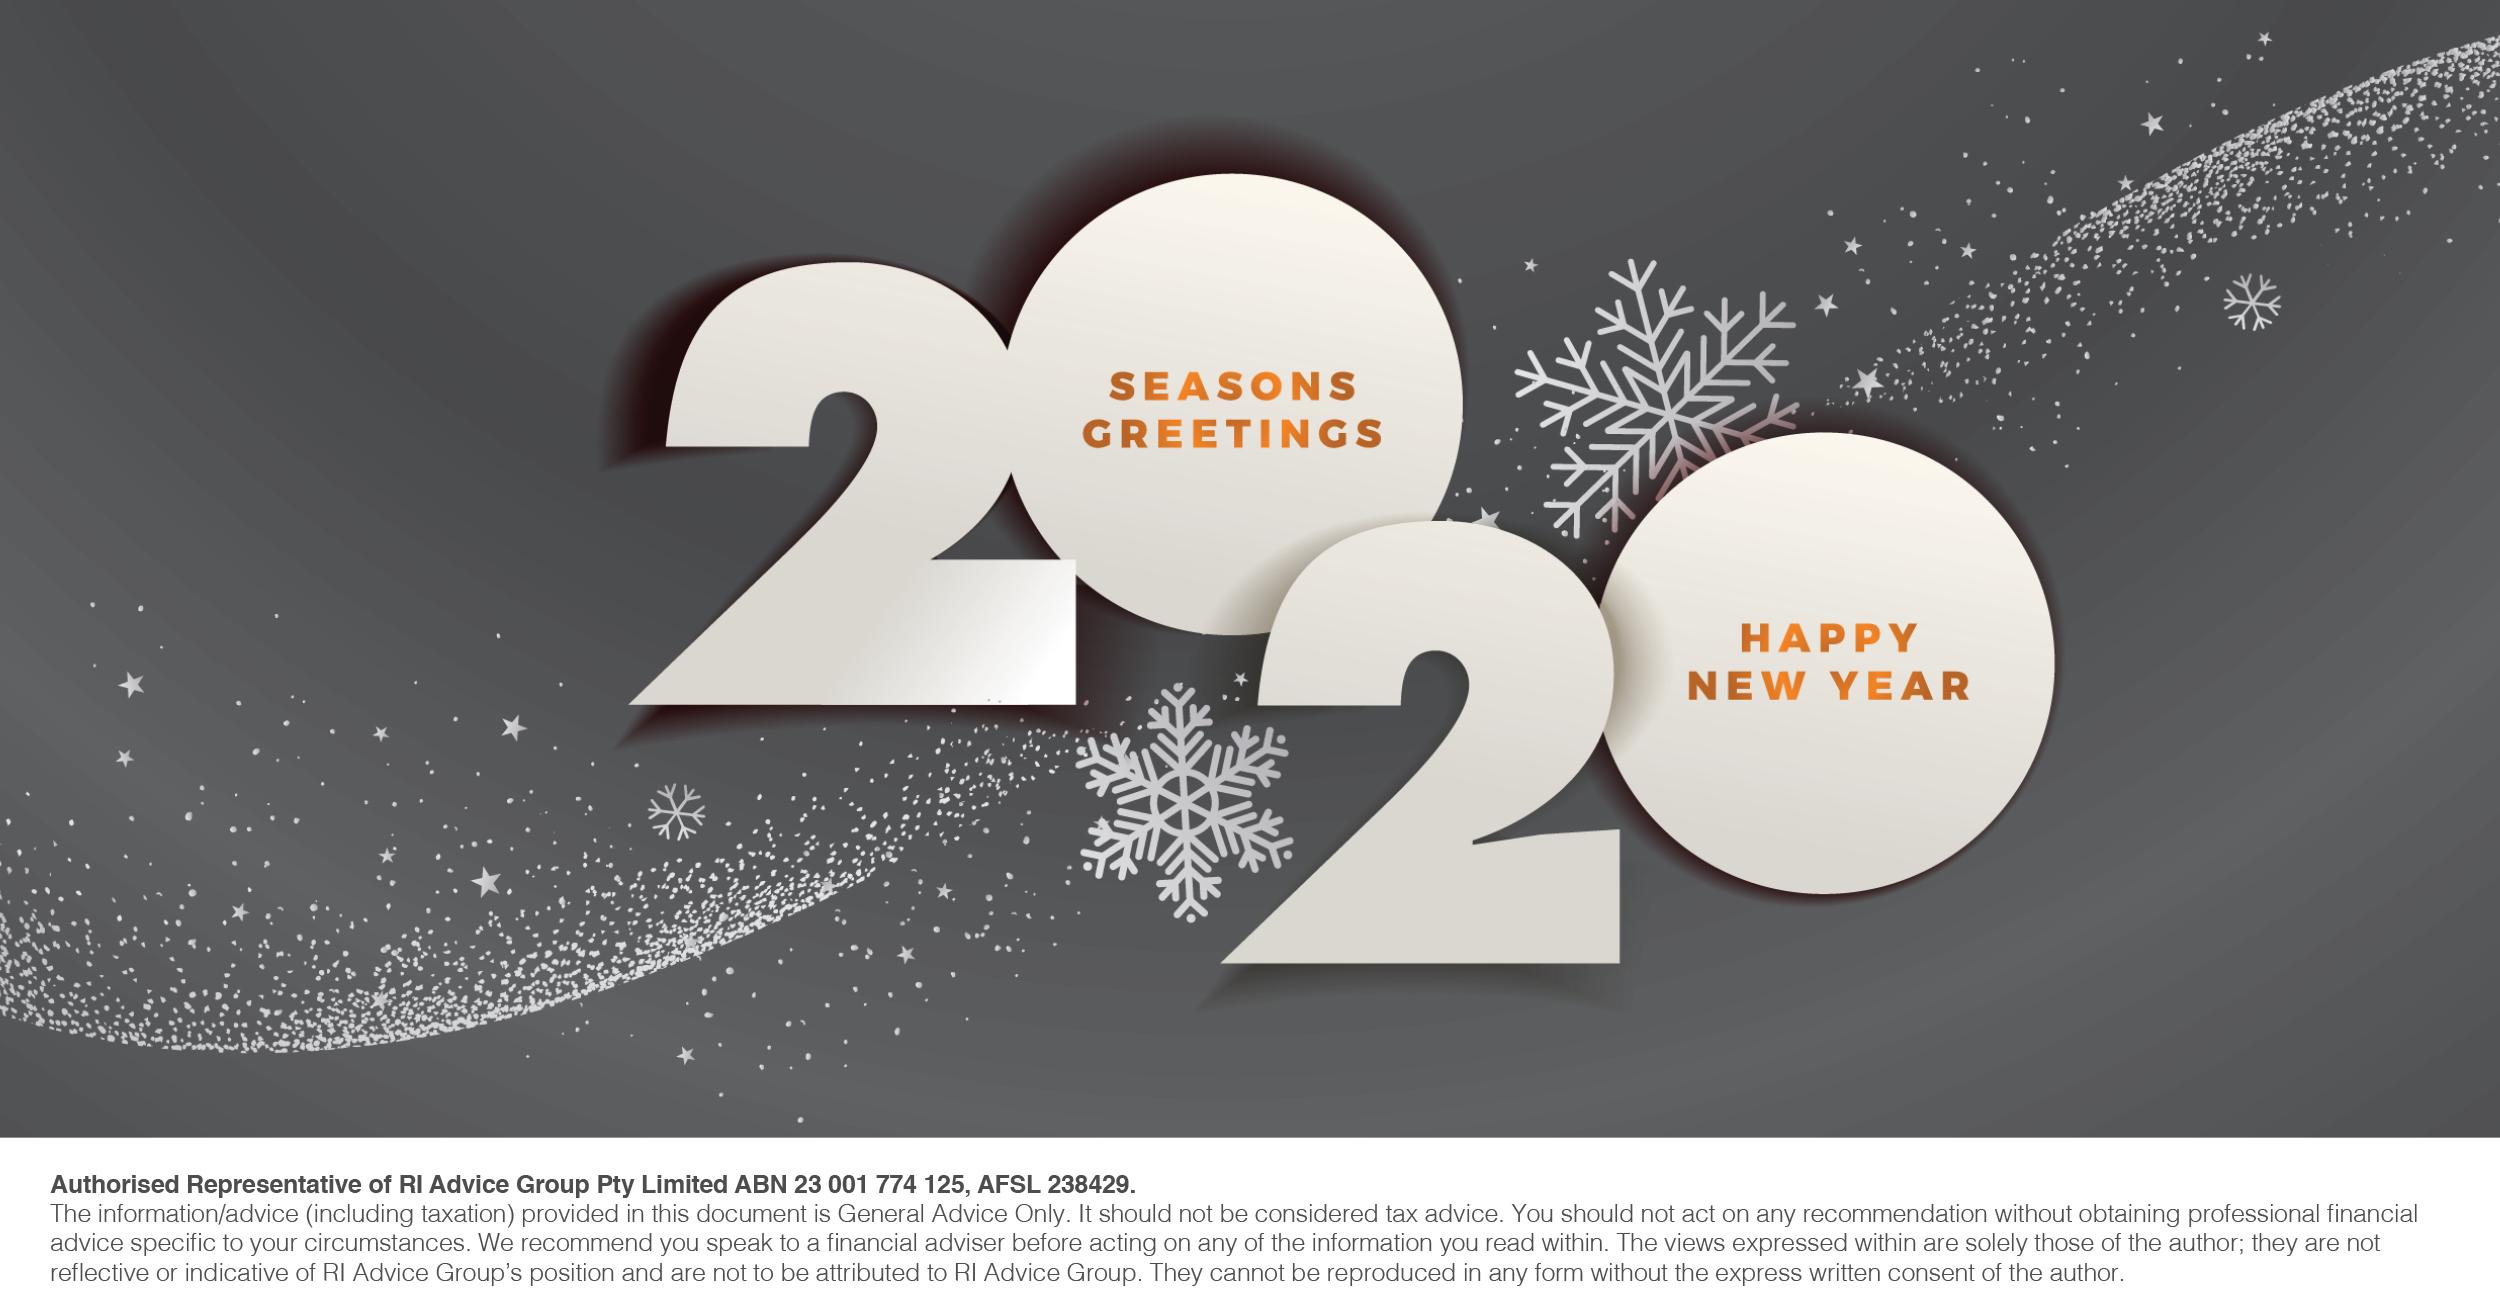 Infographic_Seasons greetings1_RI